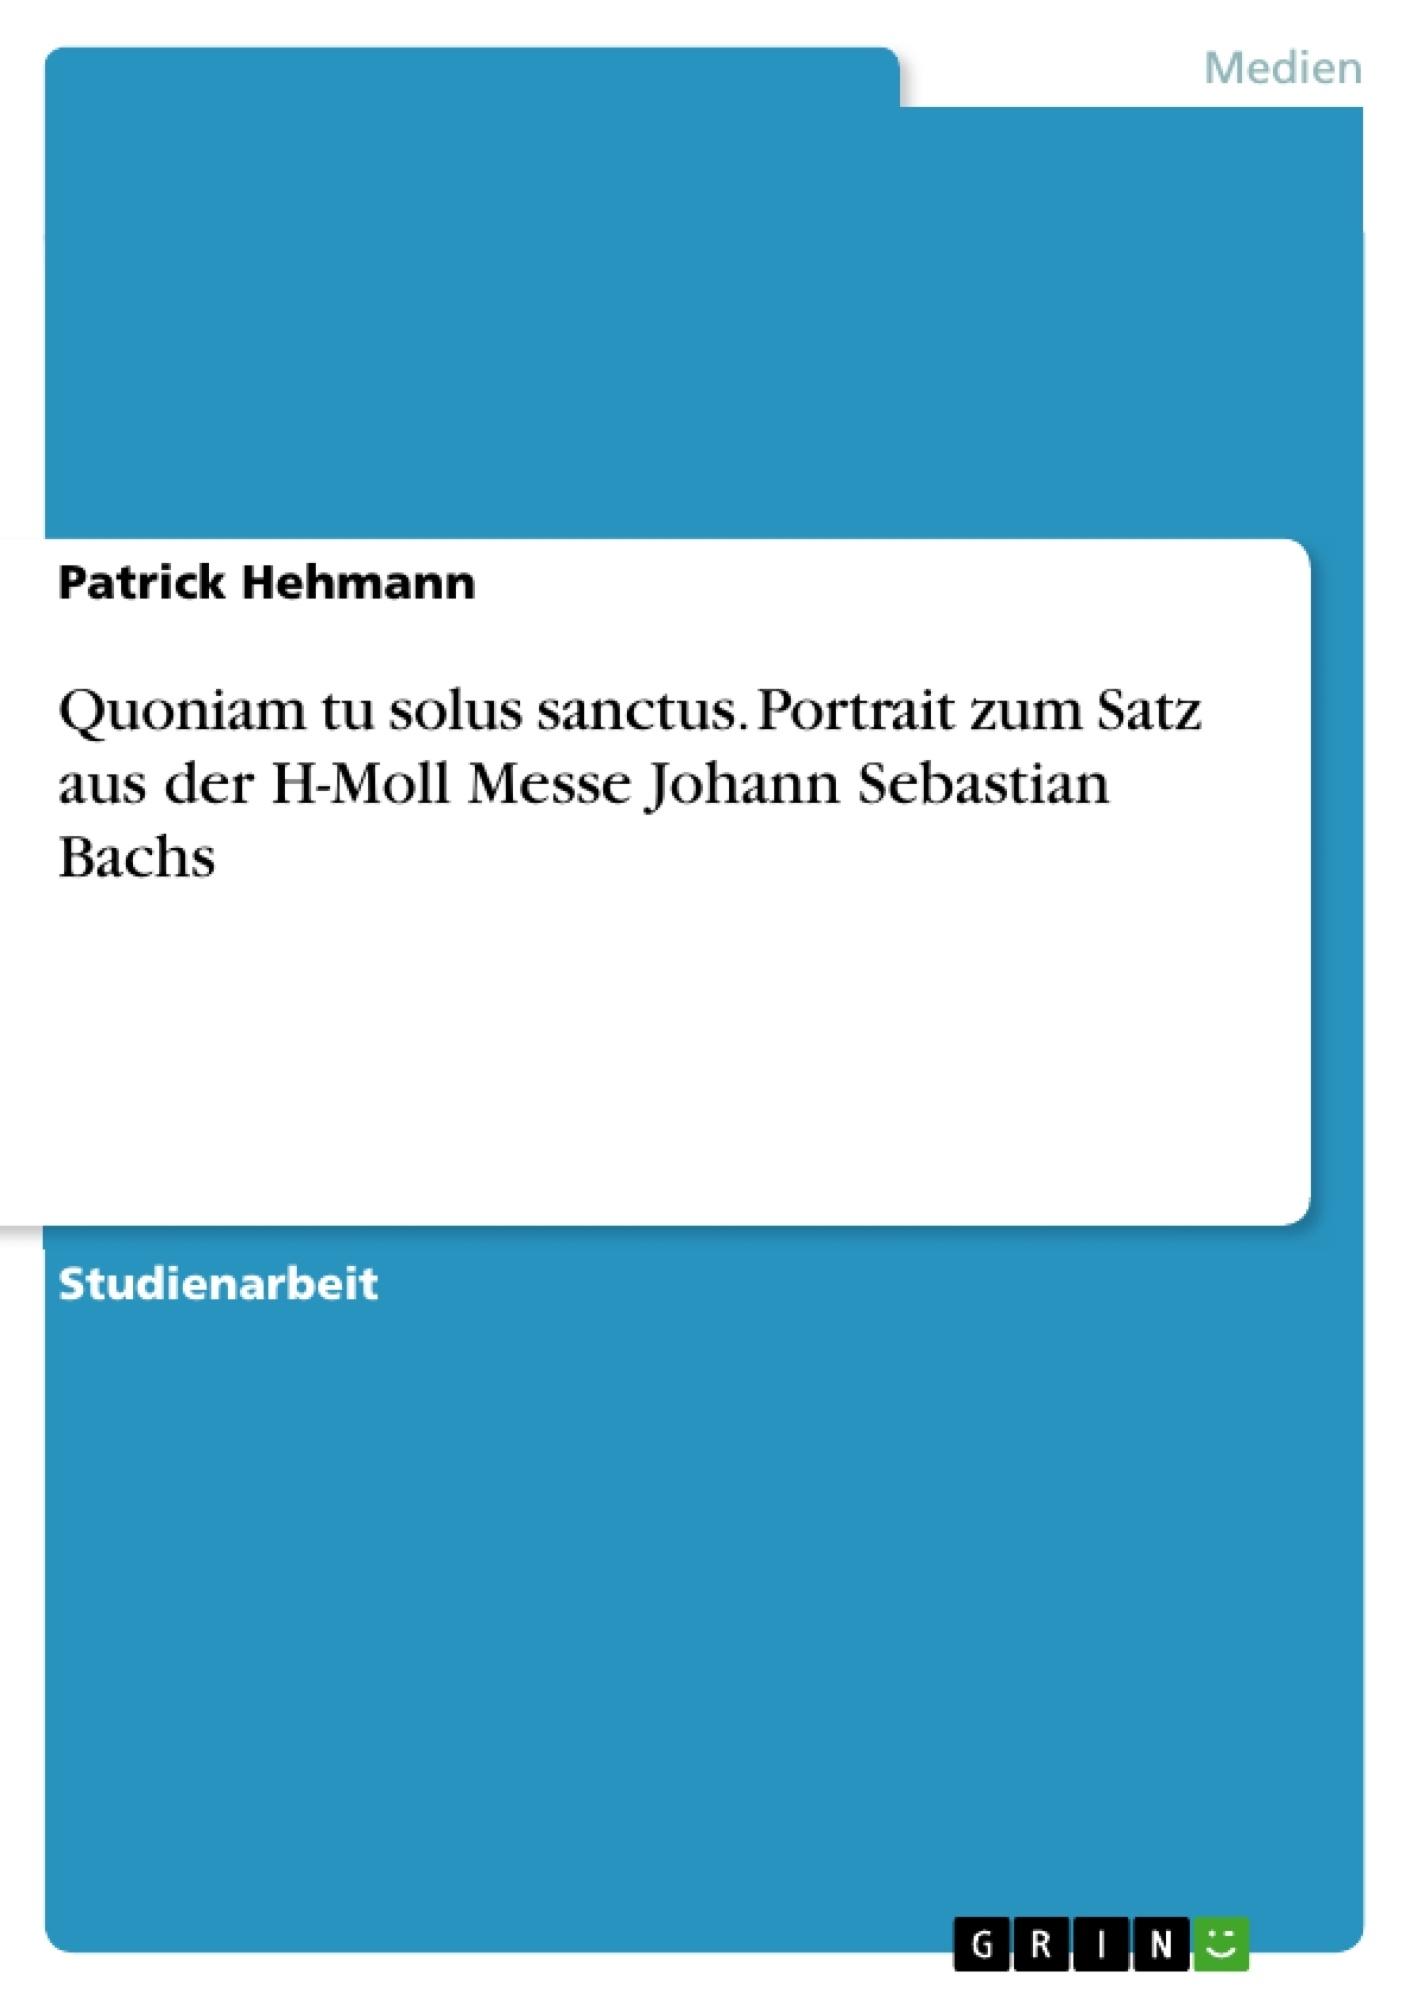 Titel: Quoniam tu solus sanctus. Portrait zum Satz aus der H-Moll Messe Johann Sebastian Bachs